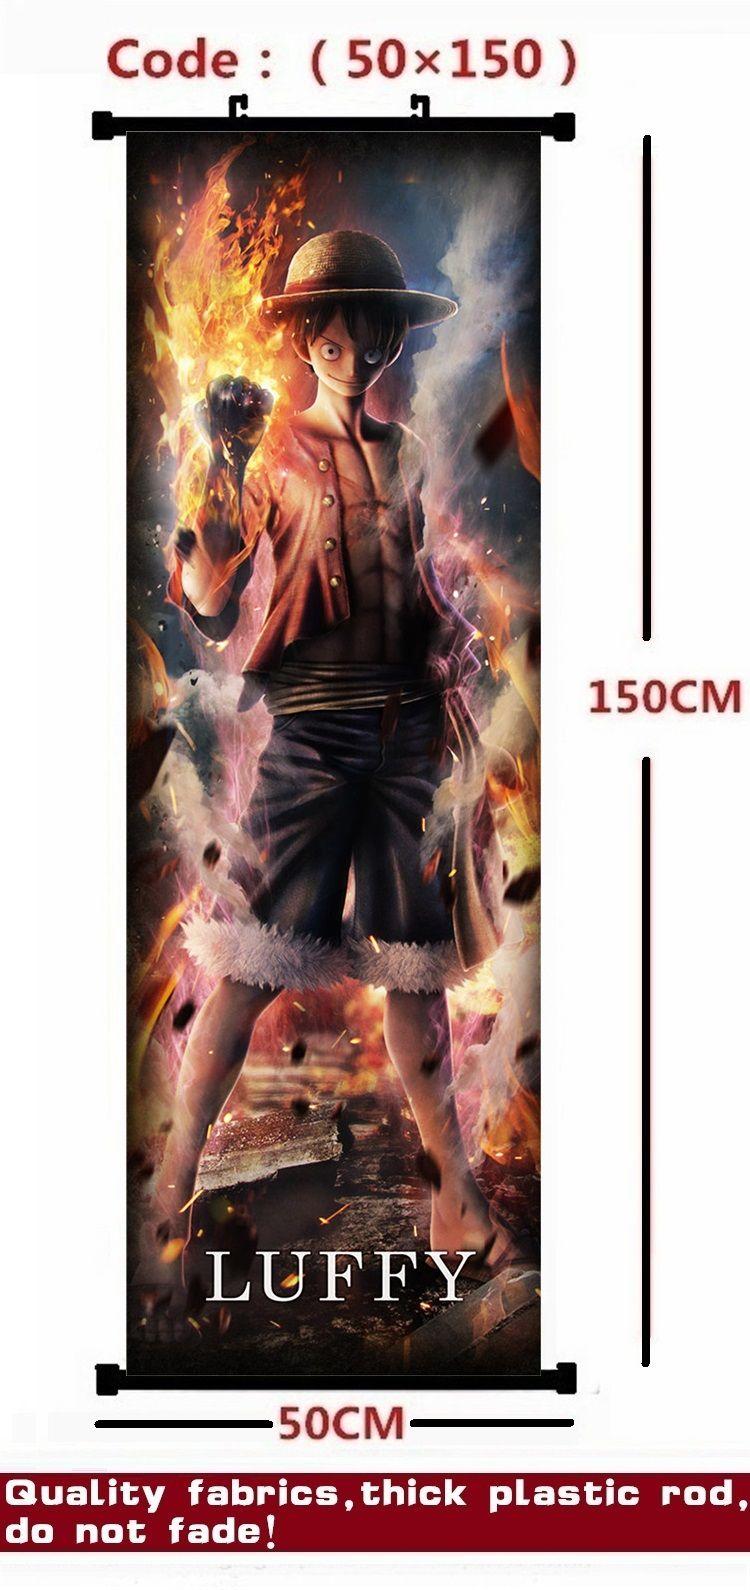 Anime / ONE PIECE Monkey D. Ruffy / Portgas.D.Ace / Sabo Verbrennung Ausgabe Schöne hängende Bild / Plakat / Stoffmalerei / Wand